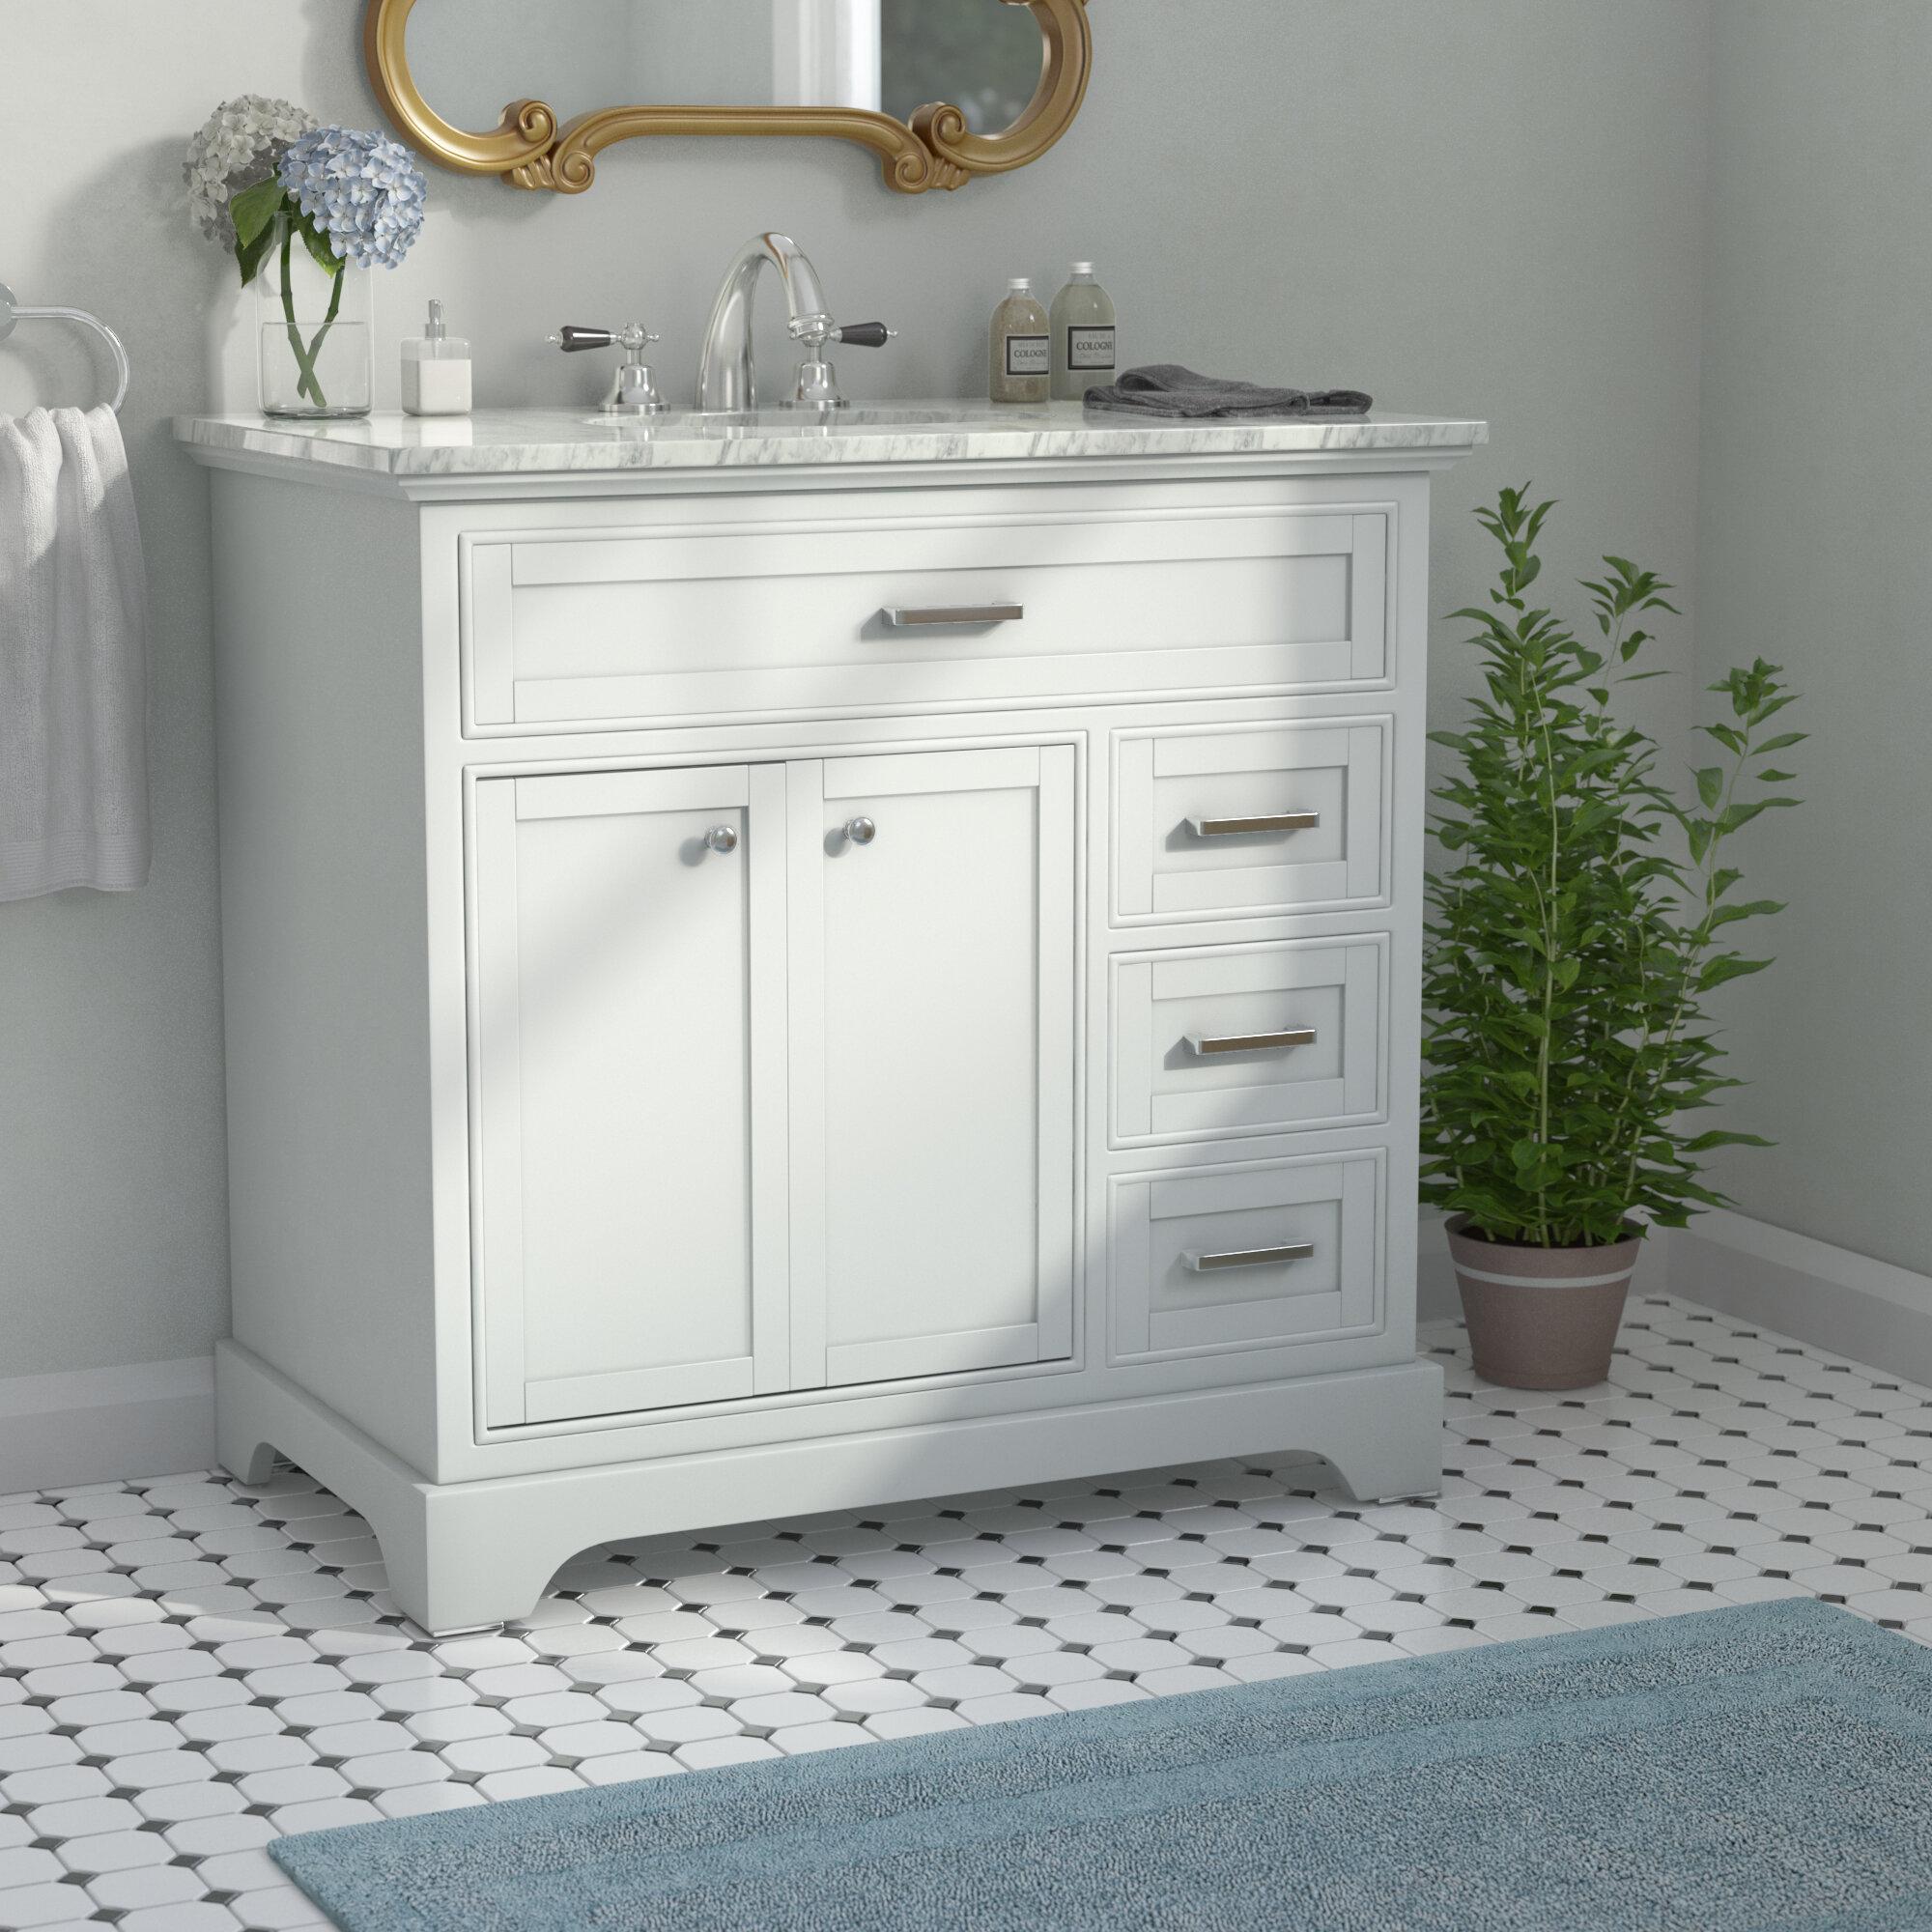 Peachy Darry 36 Single Bathroom Vanity Set Interior Design Ideas Clesiryabchikinfo